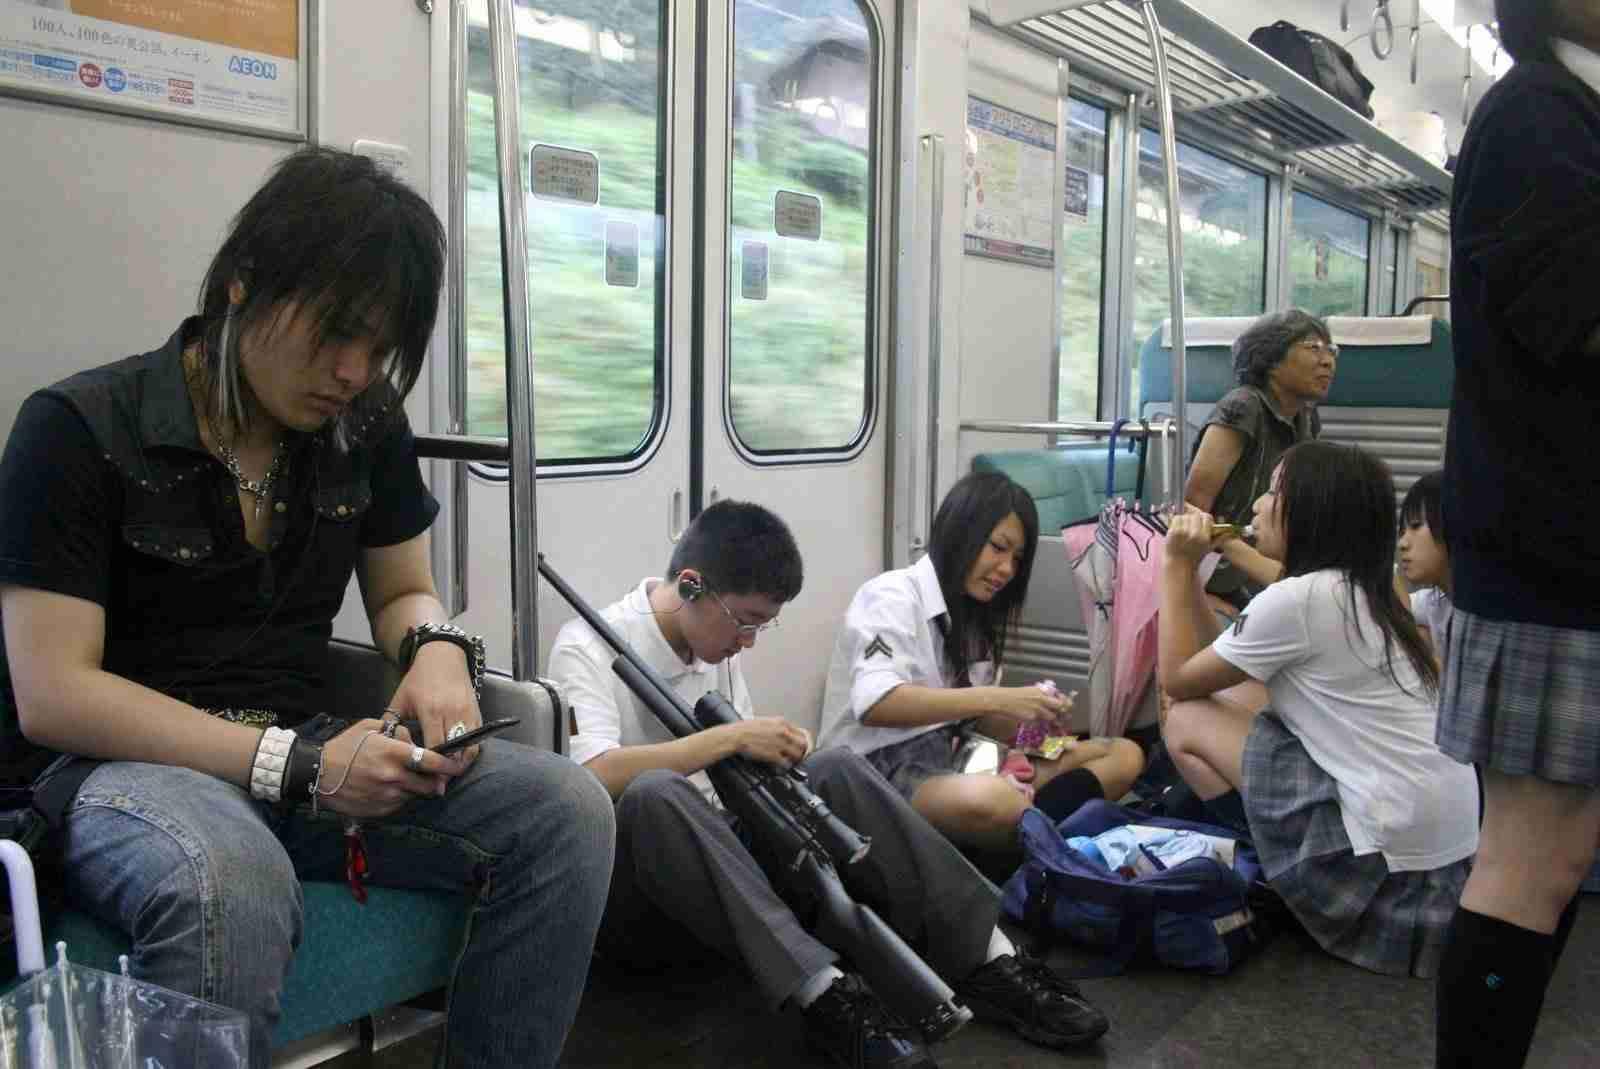 JR東、新車両に防犯カメラ 18年度製造分から「乗客のプライバシー侵害の恐れ」との指摘も